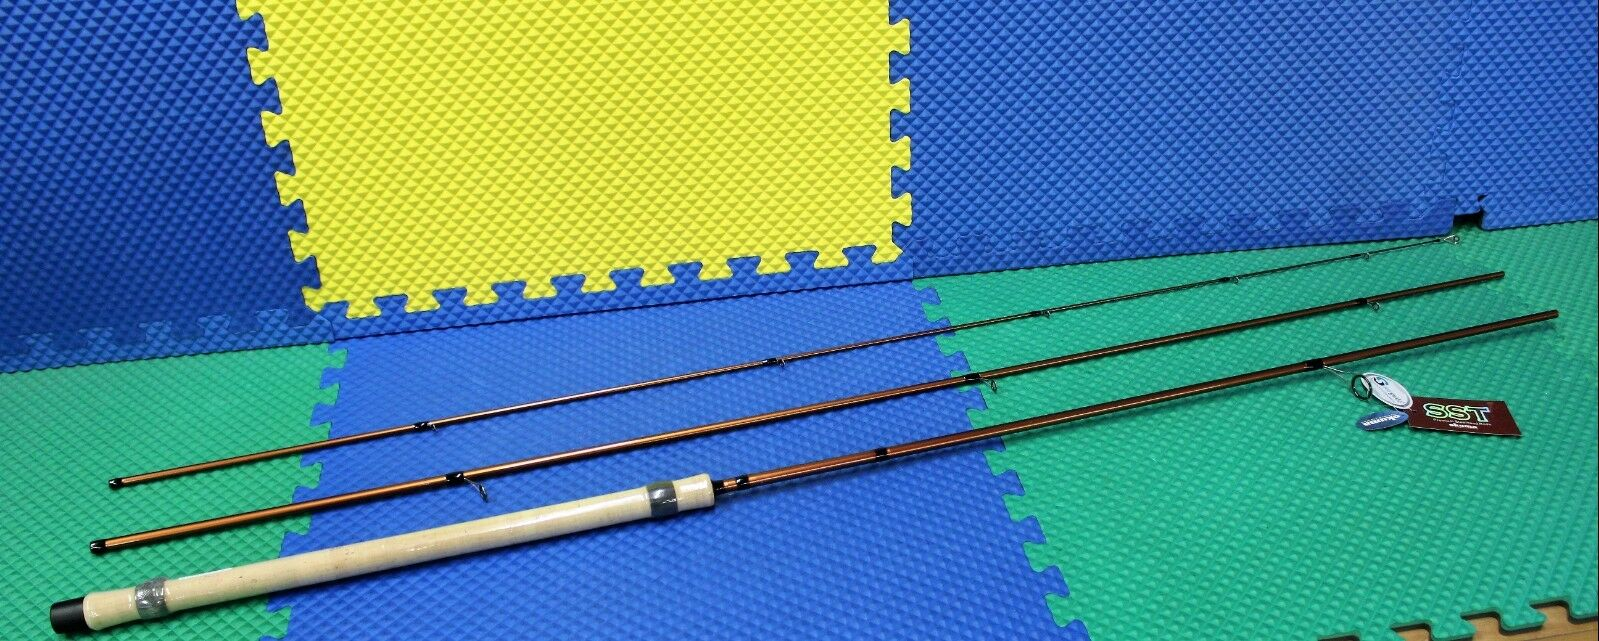 Okuma SST 13' 4  Spinning Float Rod  3  Piece SST-S-1343FR  cheap sale outlet online